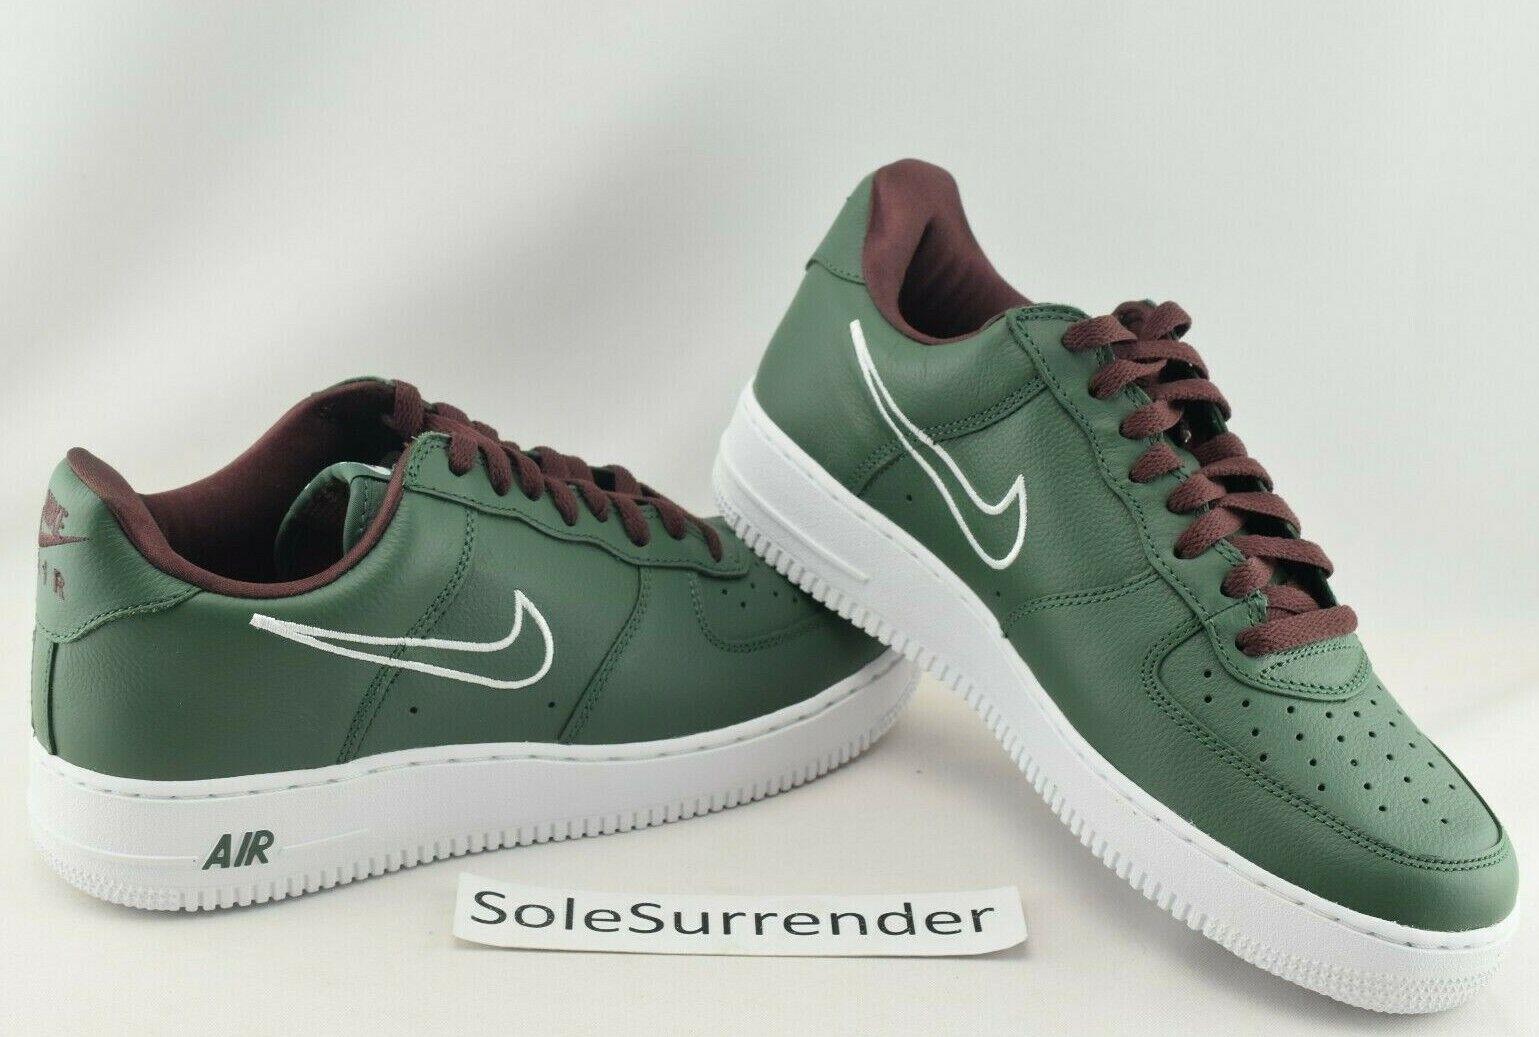 Nike Air Force 1 Low Retro Hong Kong - CHOOSE SIZE - 845053-300 White Dark OG QS